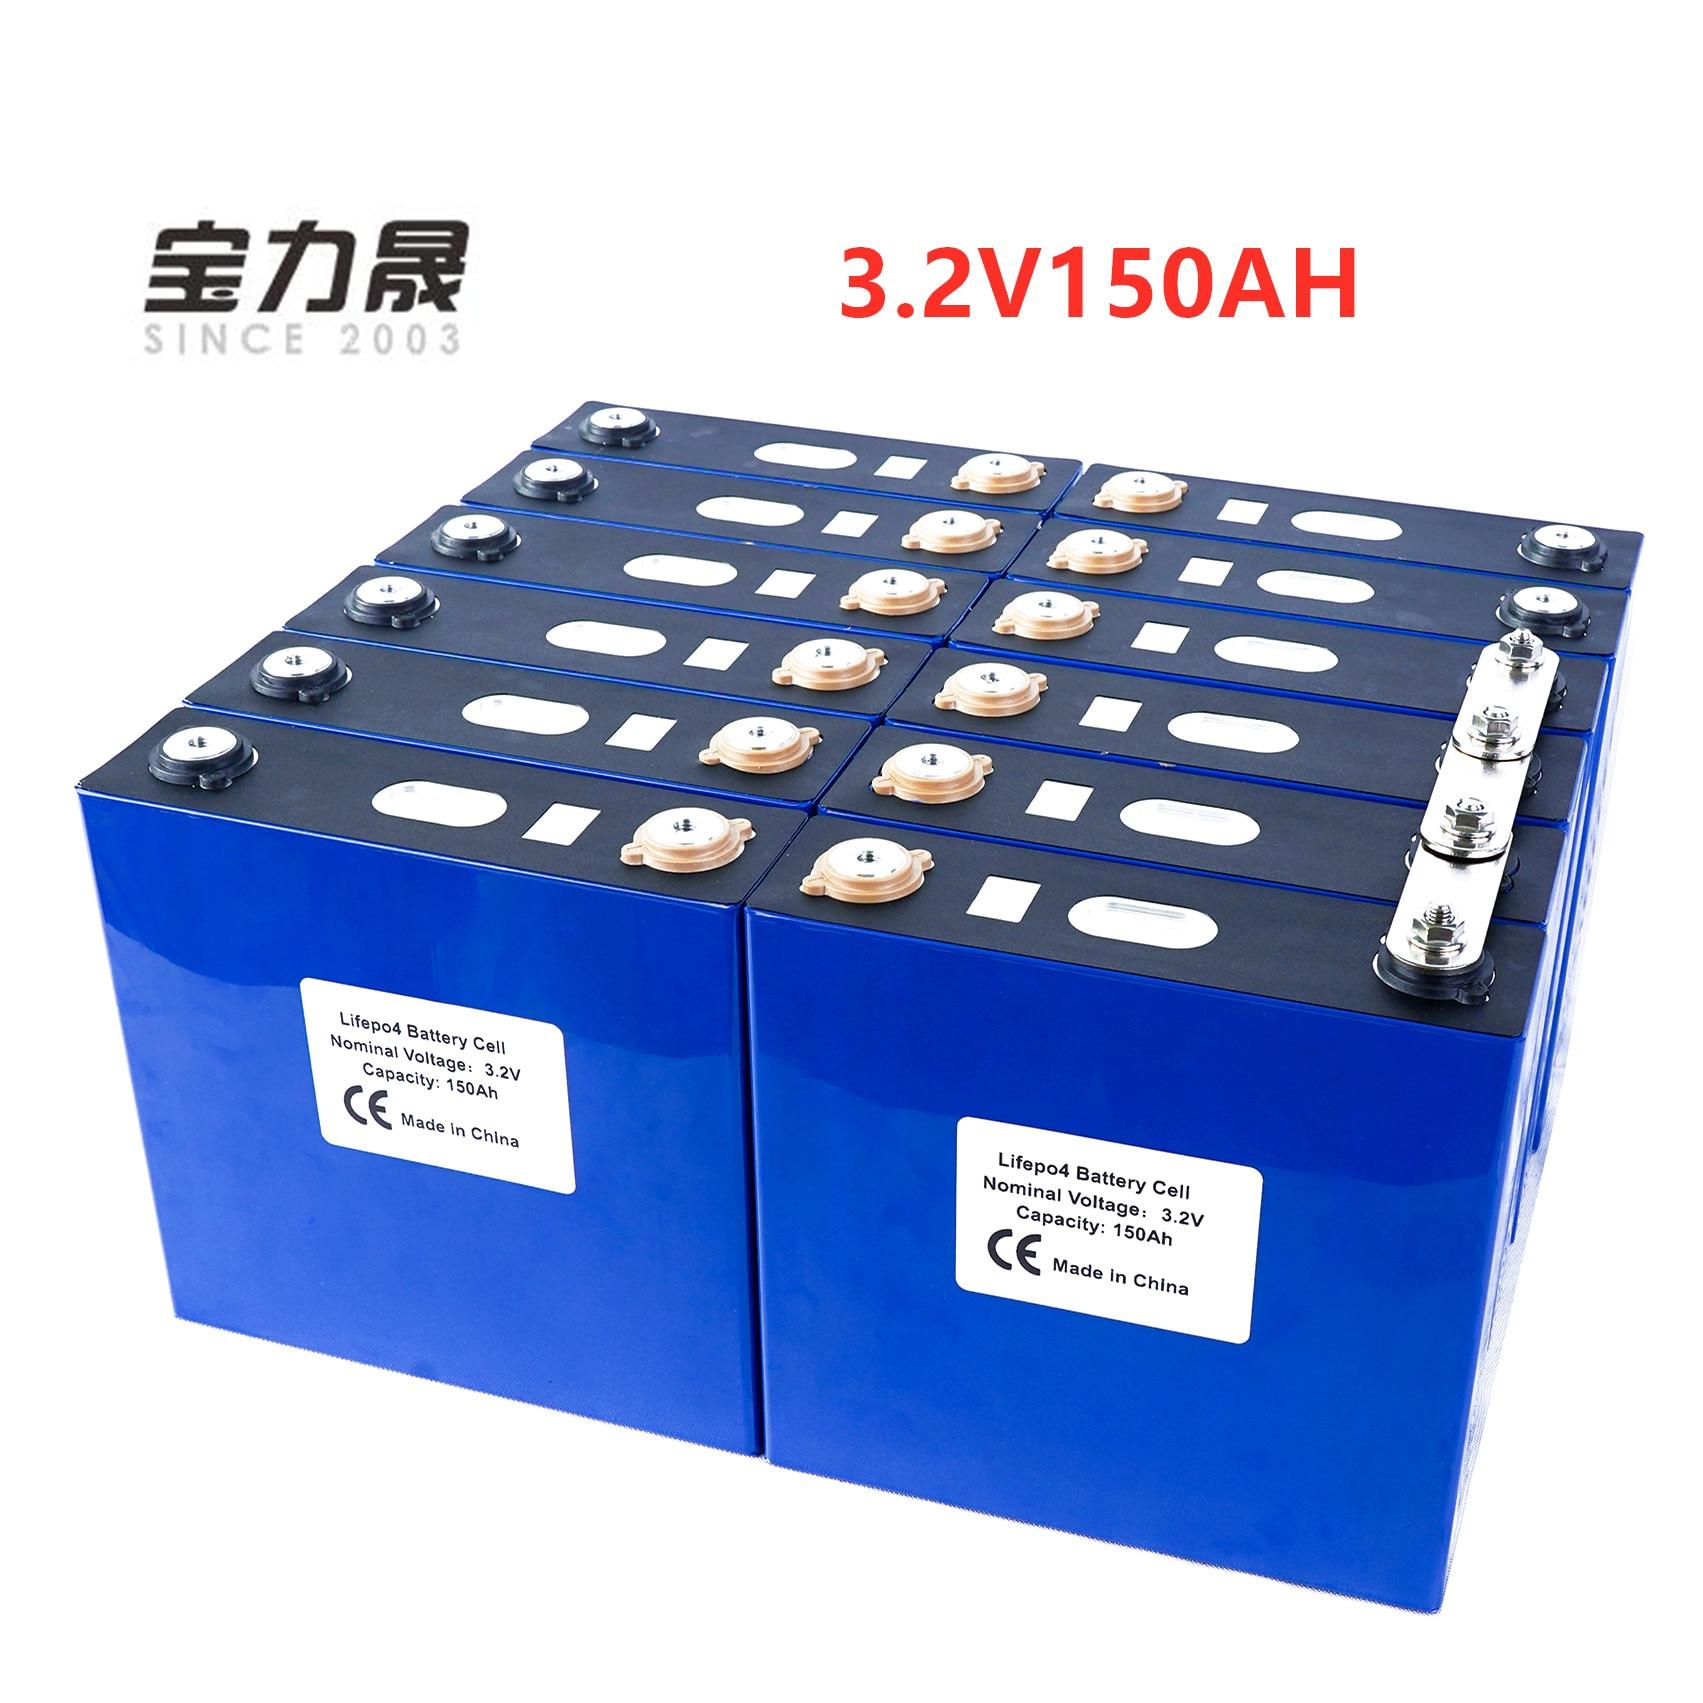 2019 NEW 16PCS 3.2V 150Ah Lithium Iron Phosphate Cell Lifepo4 Battery  Solar 24V300AH 48V150Ah Cells Not 120Ah EU US TAX FREE